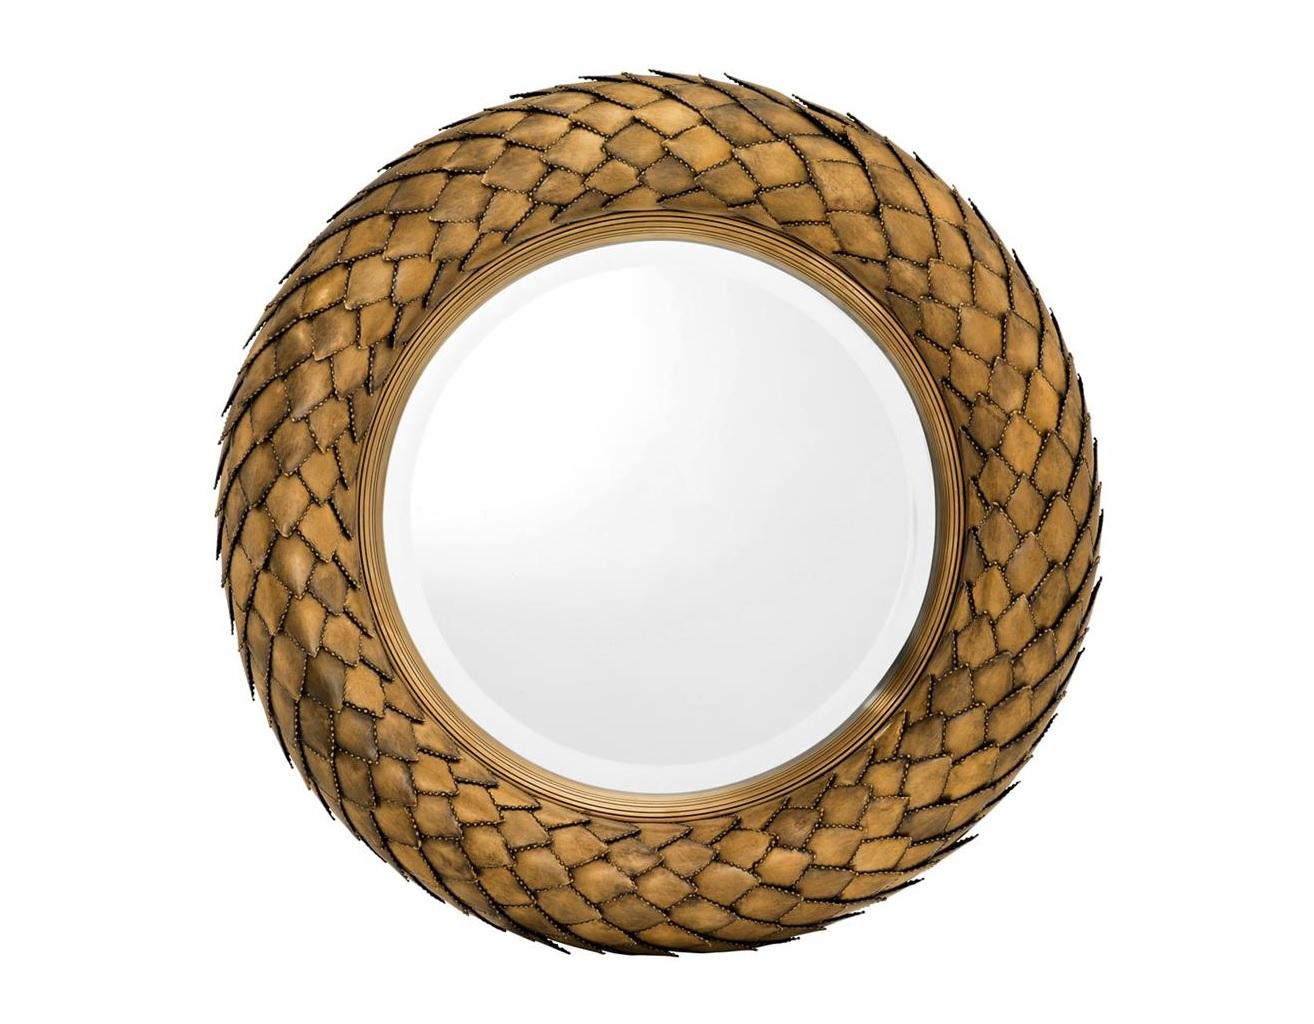 Зеркало Mirror LaurelНастенные зеркала<br><br><br>Material: Металл<br>Ширина см: 60.0<br>Высота см: 60.0